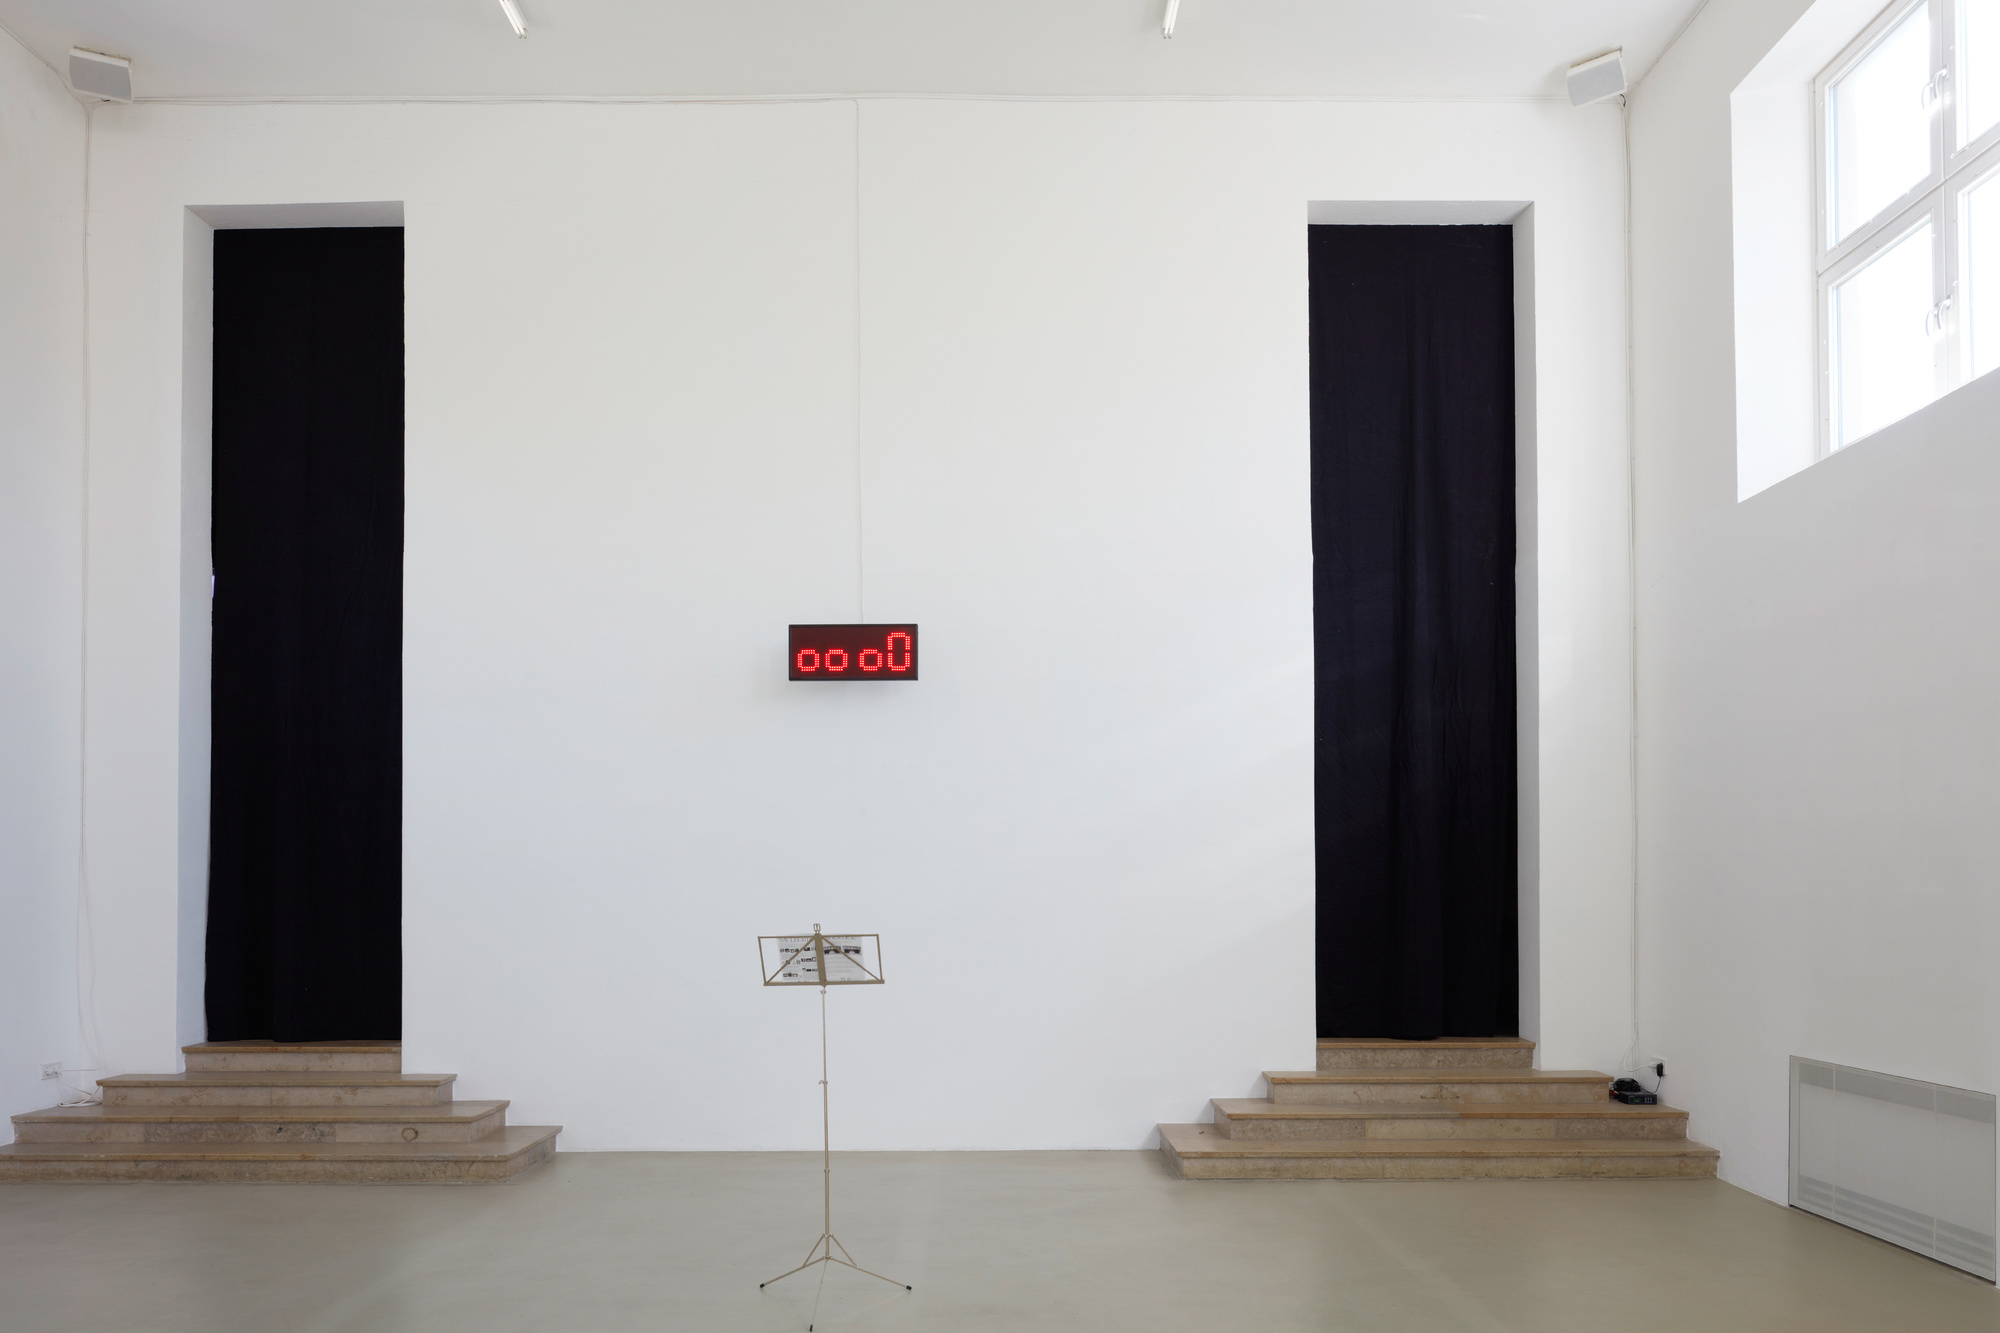 The Last ShOT Clock